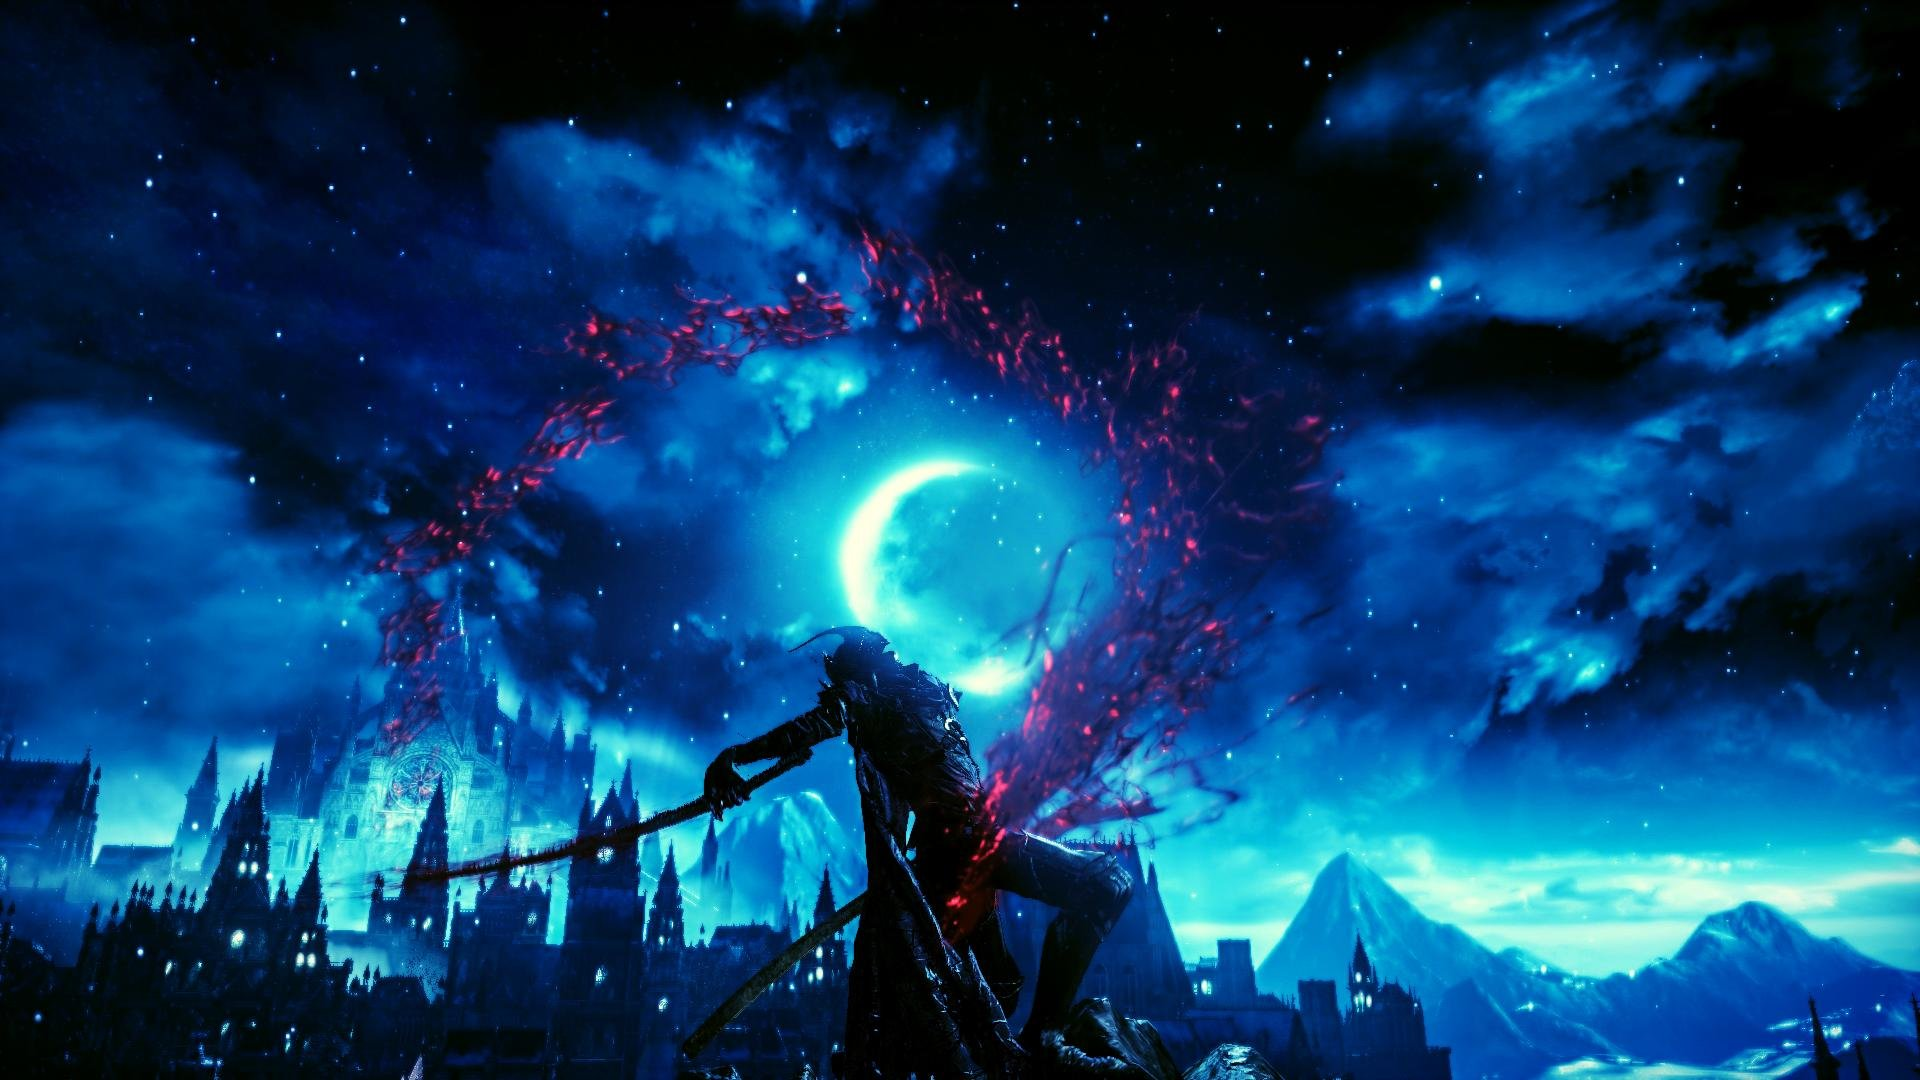 Best Dark Souls 3 Wallpaper Id 24973 For High Resolution Full Hd